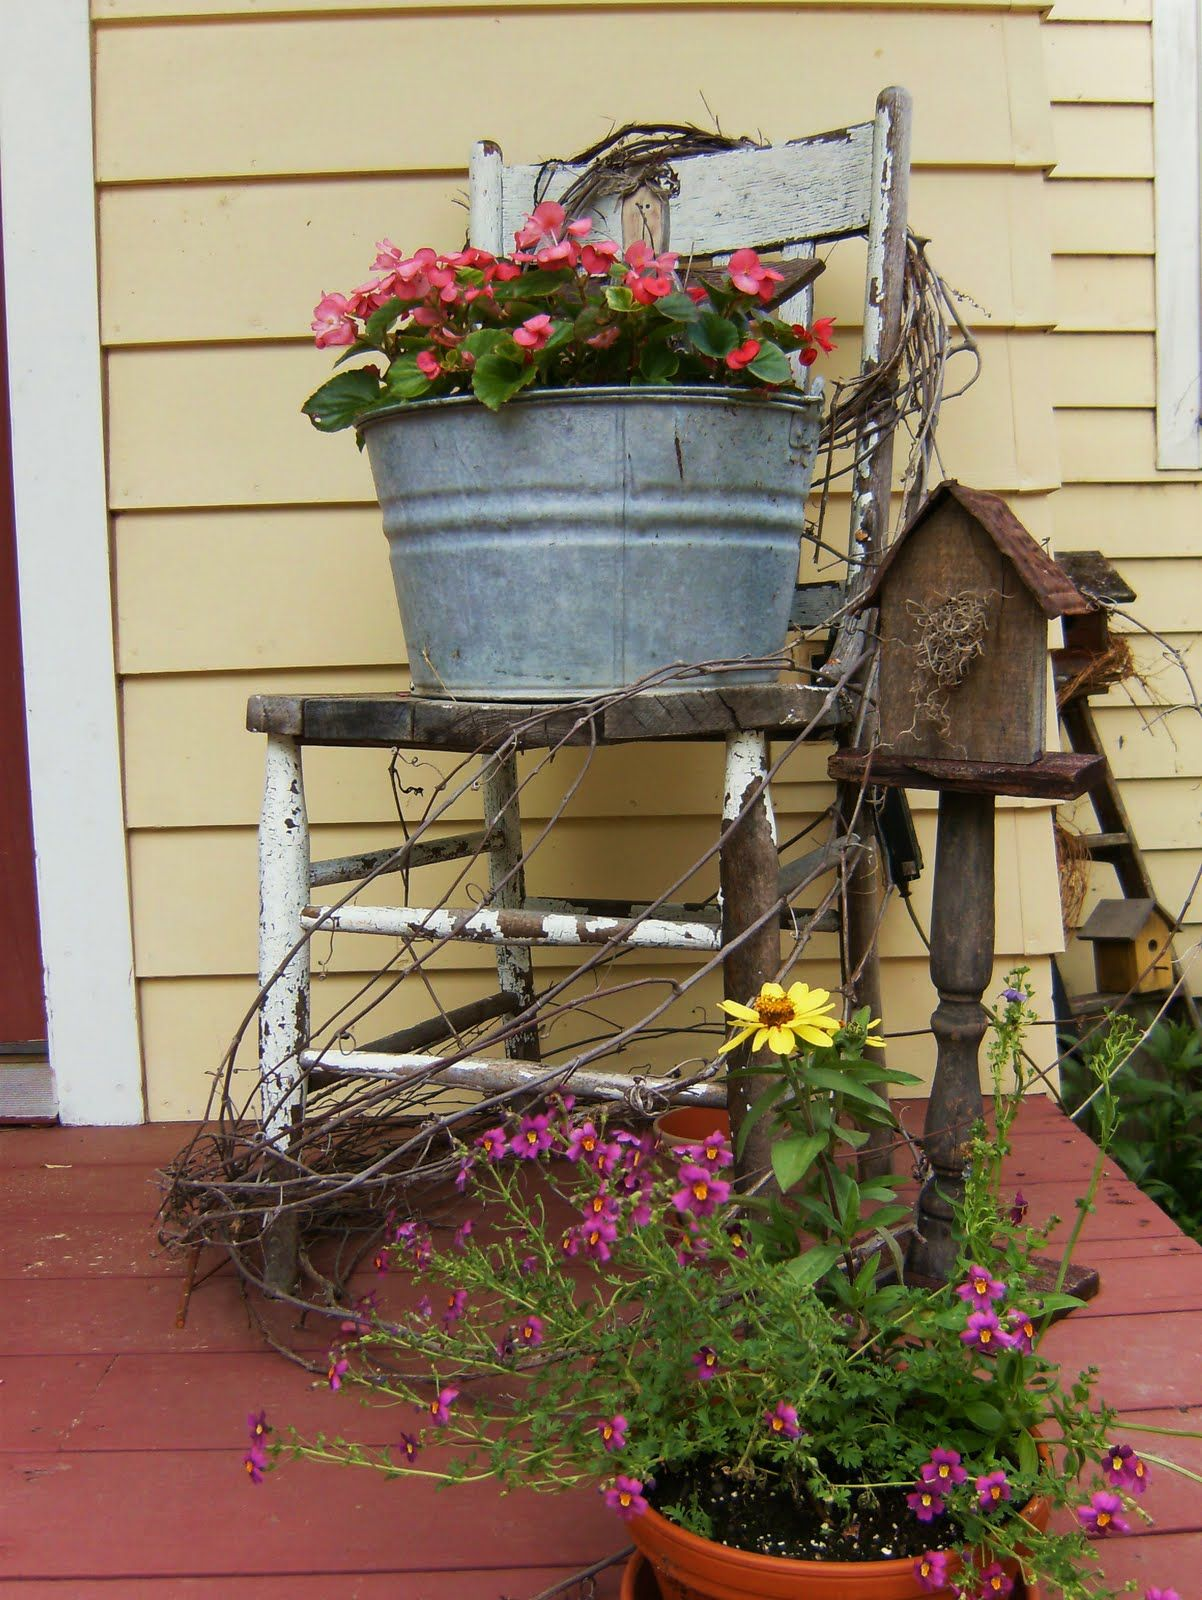 Pin de Sherri Dawson en Yard Decorating | Pinterest | Jardinería ...